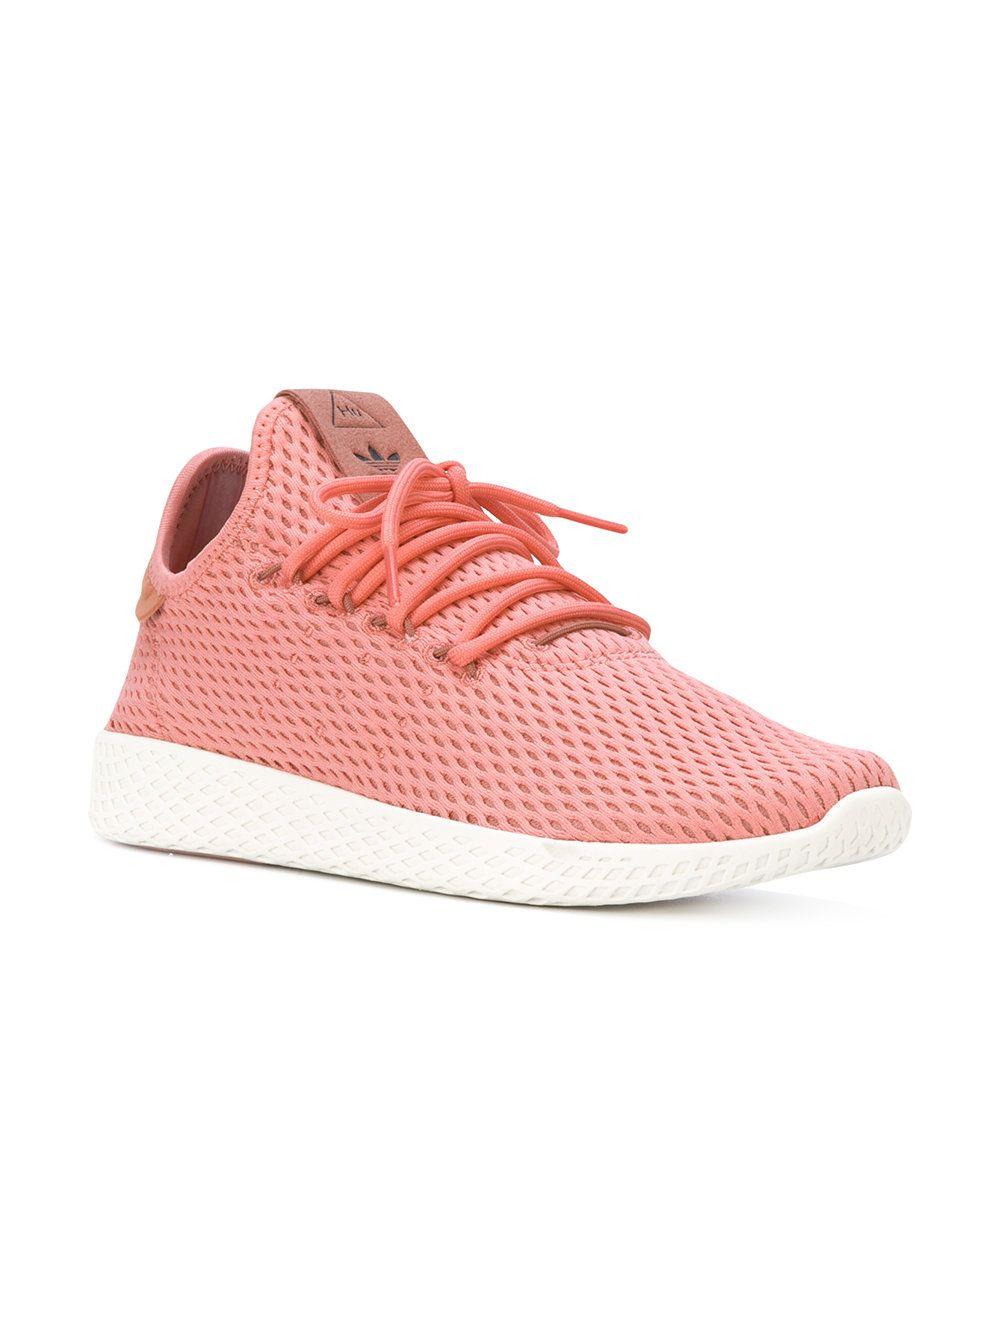 Adidas adidas Originals Tennis x Pharrell Williams Tennis Originals Hu Sneakers 1a0808